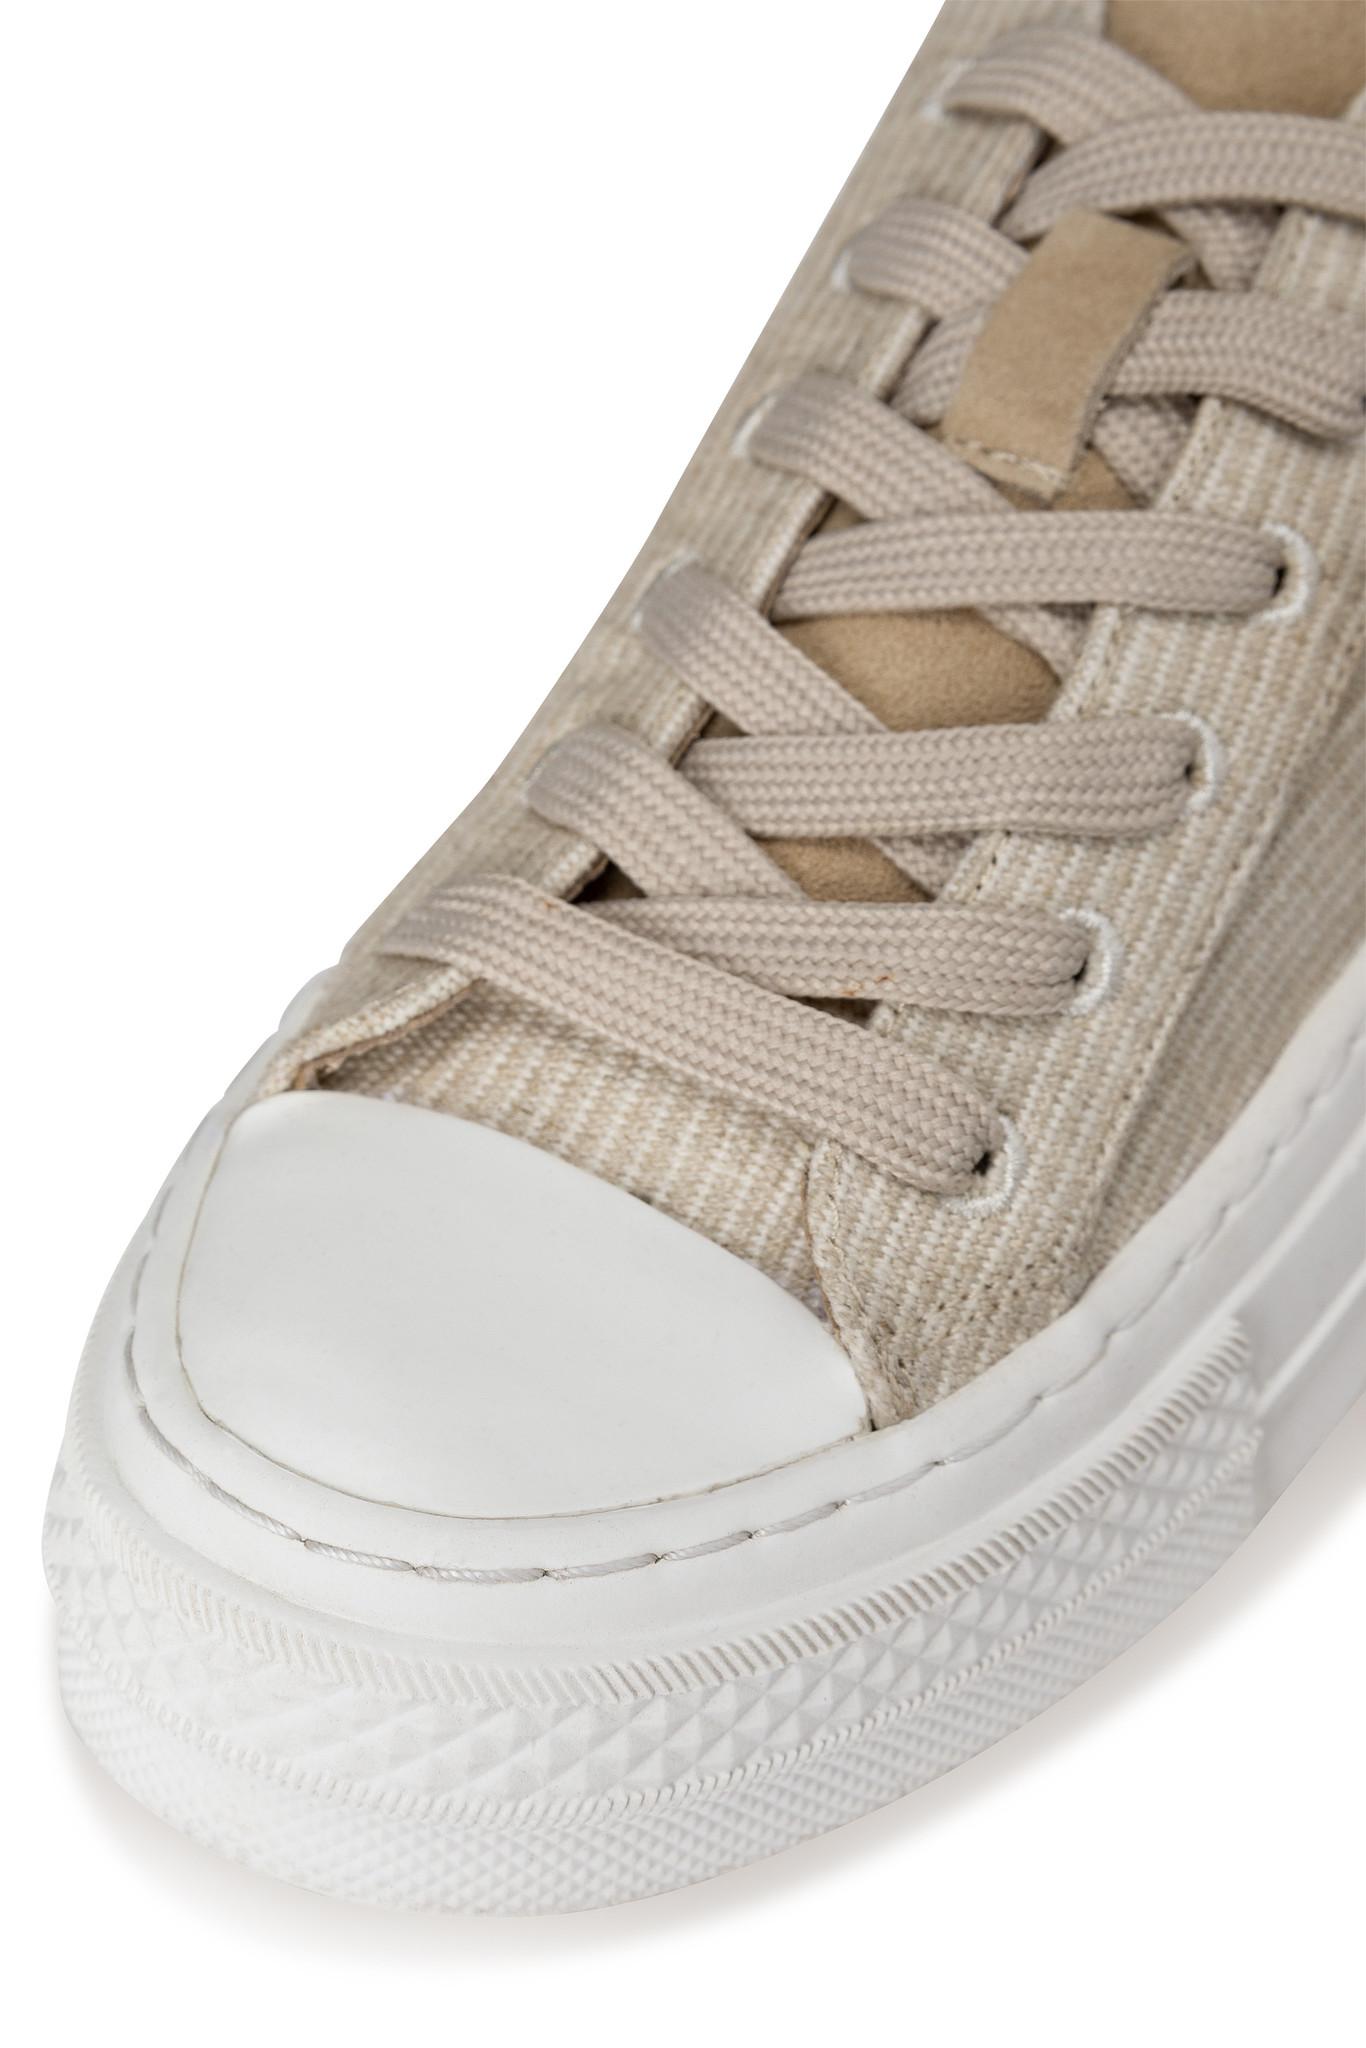 yaya Jacquard sneaker 134374-113-3